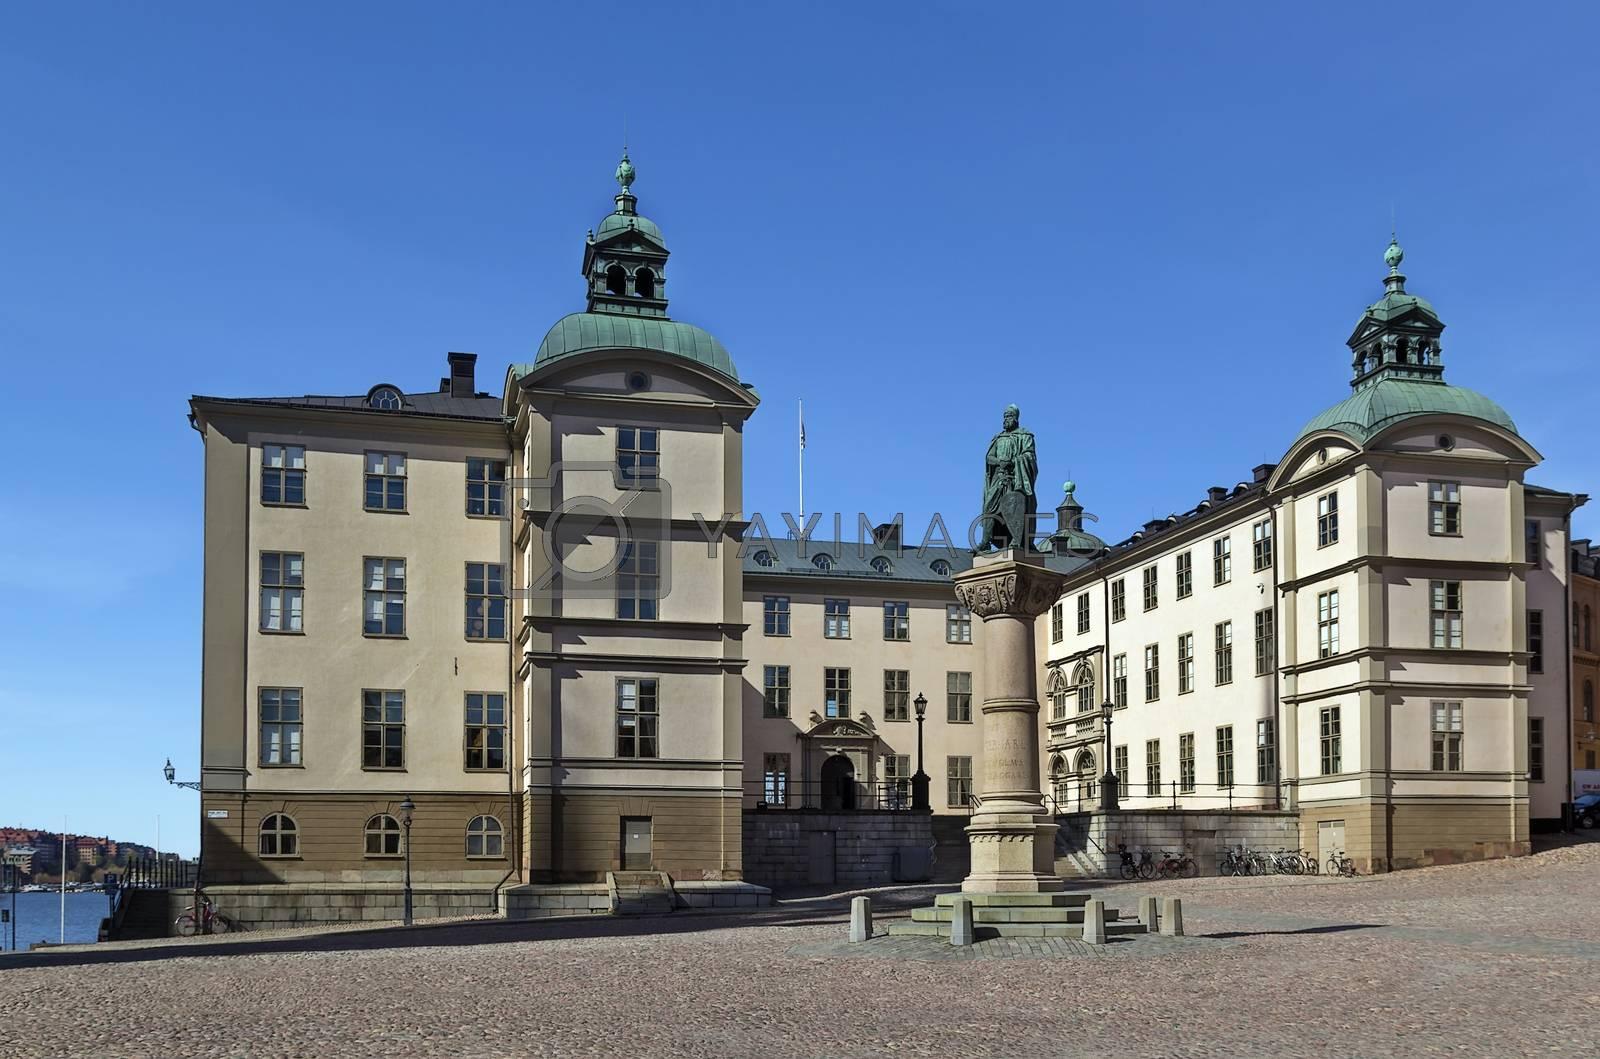 Wrangel Palace, Stockholm by borisb17